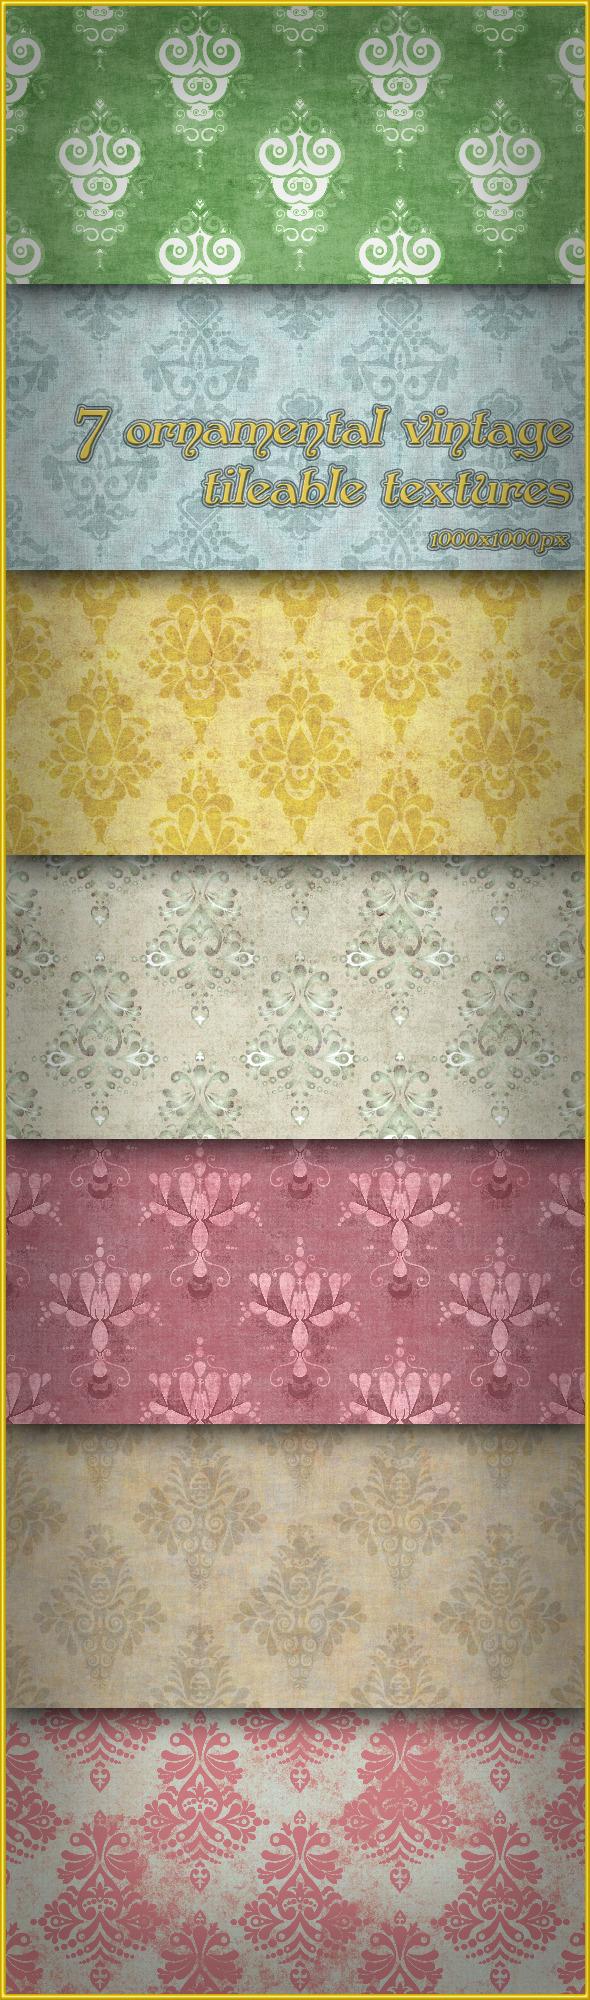 7 Ornamental Vintage Tileable Textures - Miscellaneous Textures / Fills / Patterns